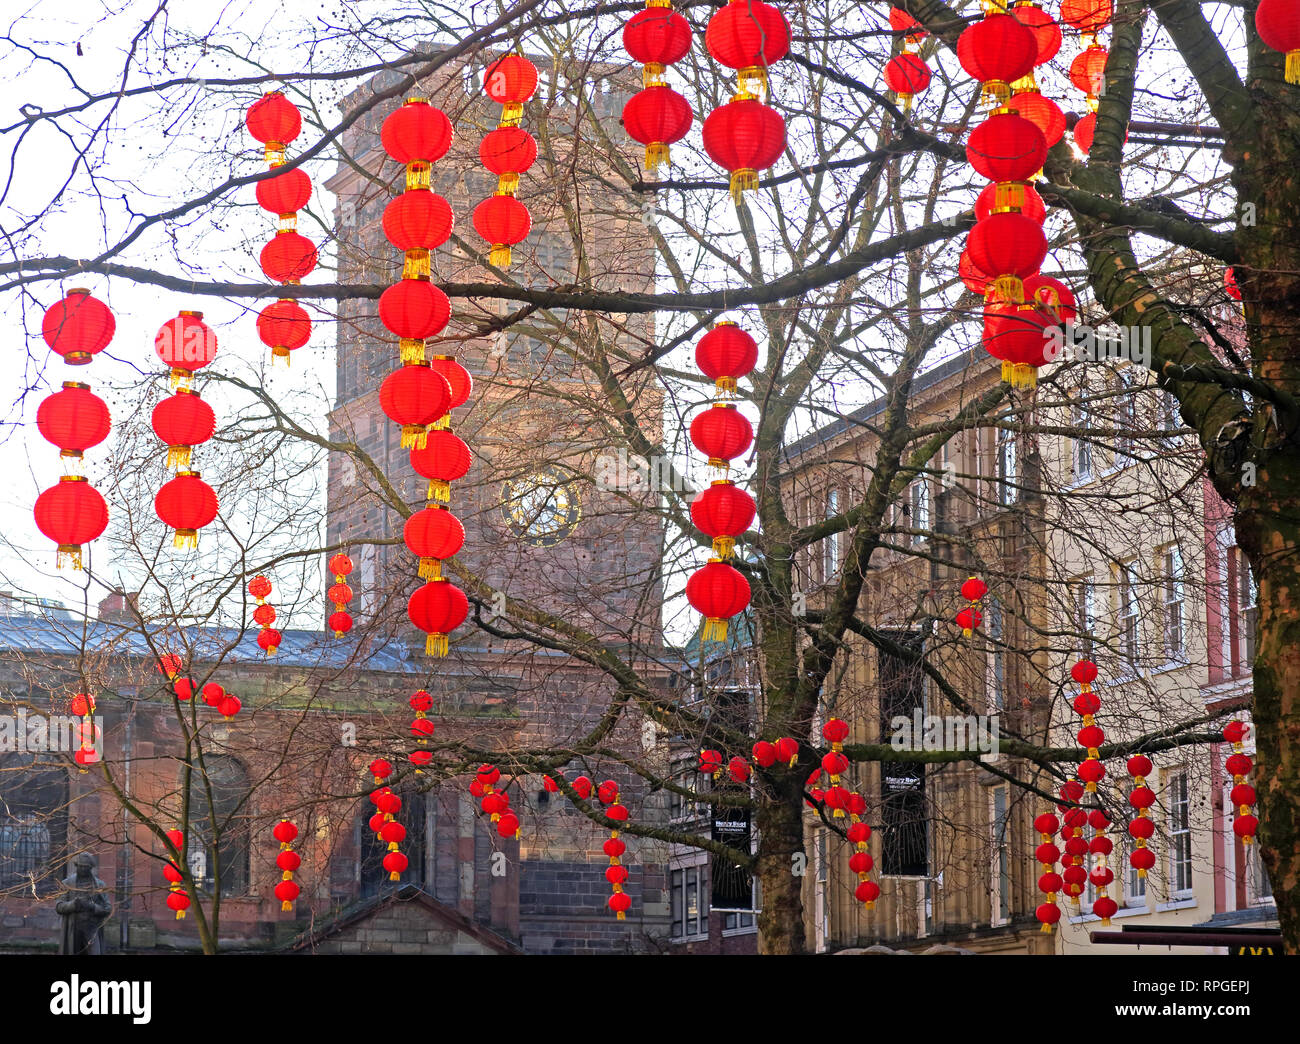 GoTonySmith,HotpixUK,@HotpixUK,Manchester,England,UK,GB,North West England,Chinese,community,Red,lantern,lanterns,celebration,festival,St Anns Square,Feb,February,winter,Church,Happy New Year,Happy Chinese New Year